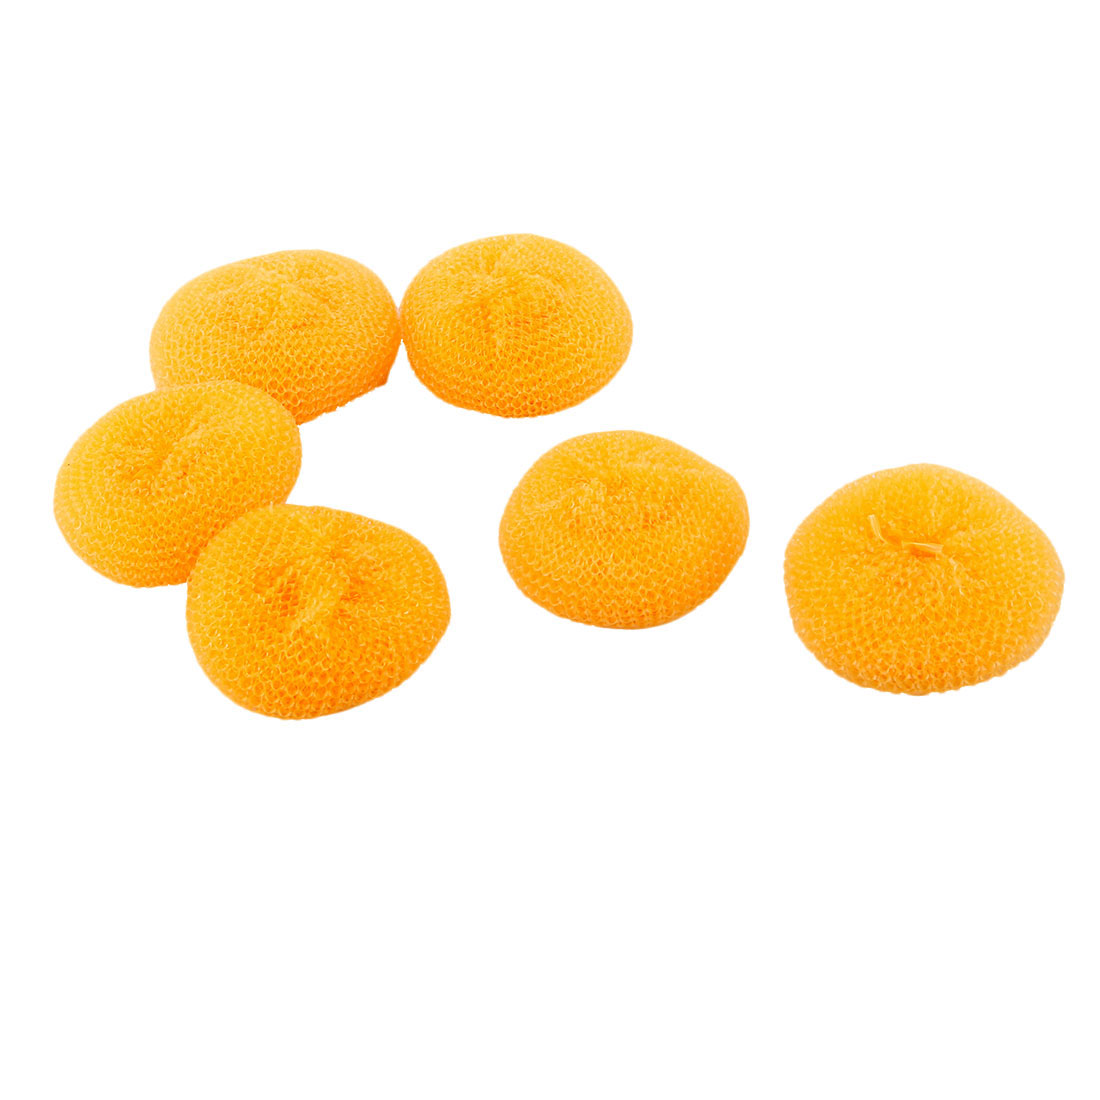 Kitchen Plastic Dish Bowl Pan Wash Clean Ball Brush Scrubber Cleaner Yellow 6pcs